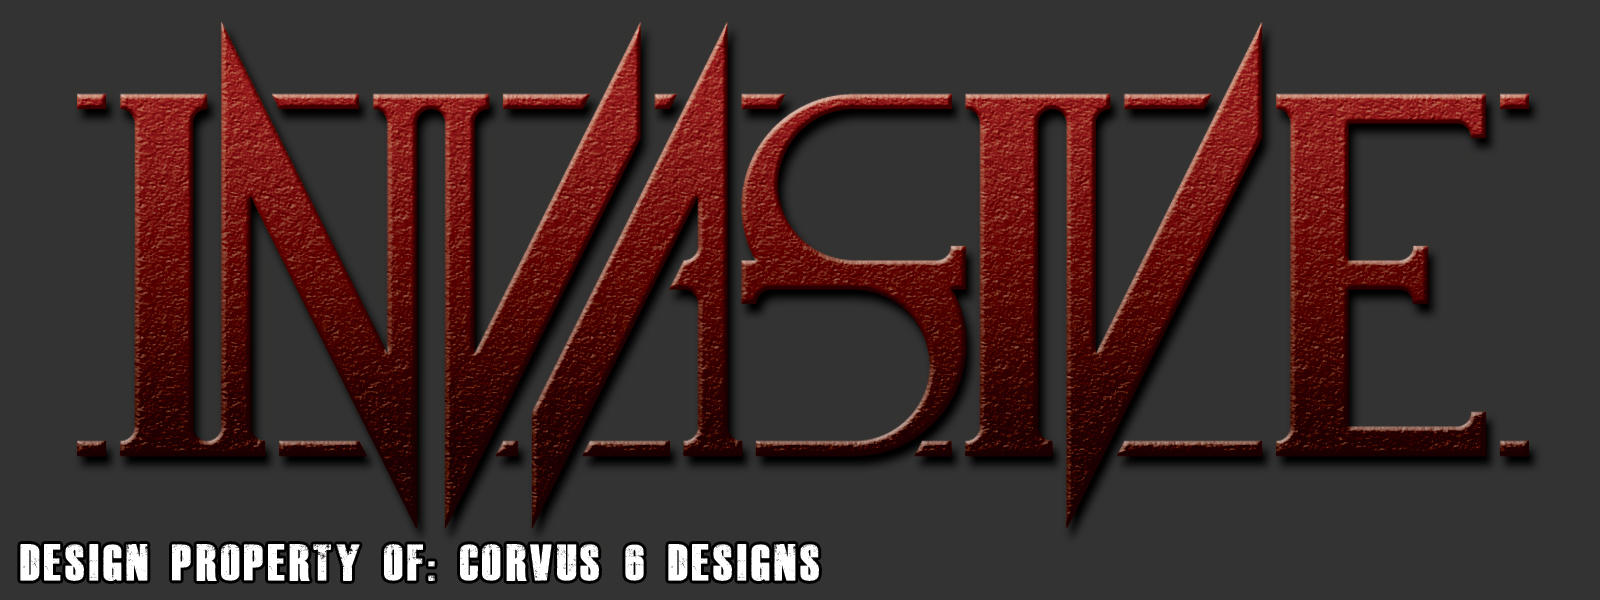 Invasive Band Logo Sample 01 by Corvus6Designs